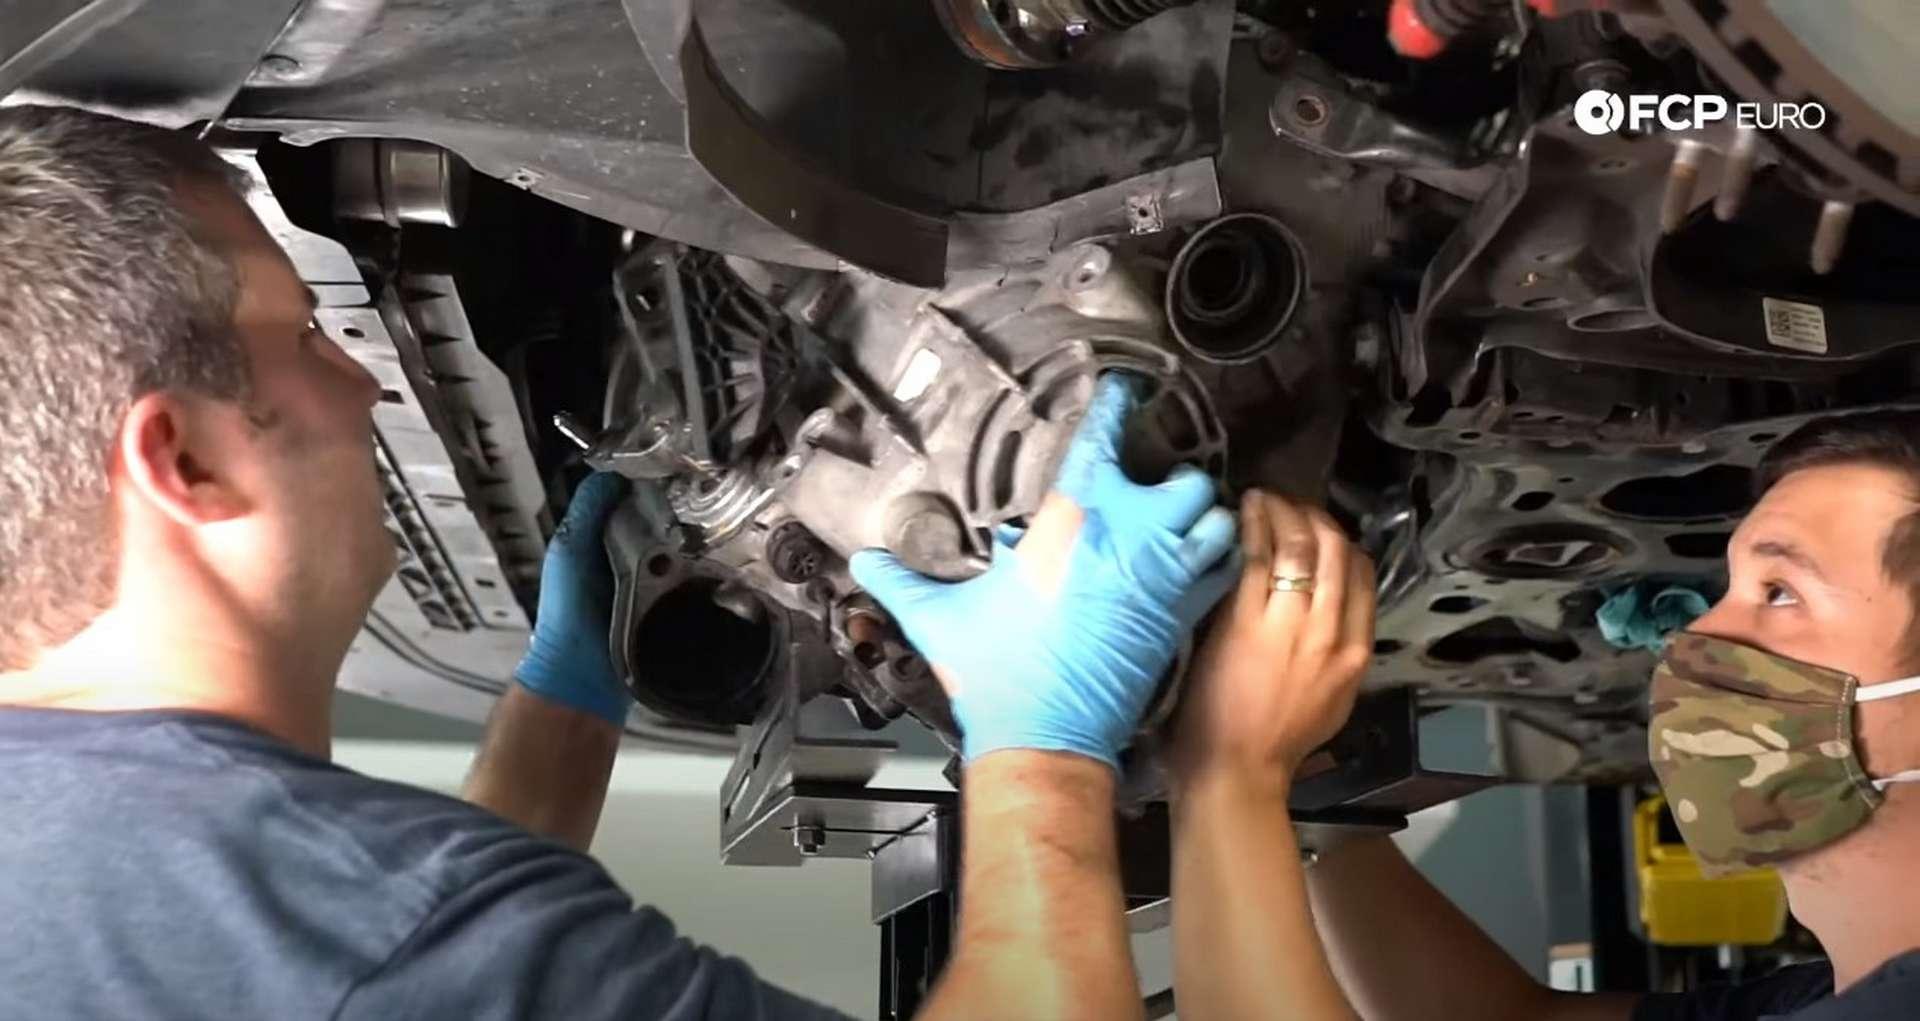 44-DIY_VW_GTI_Clutch-Job-Removing-Transmission